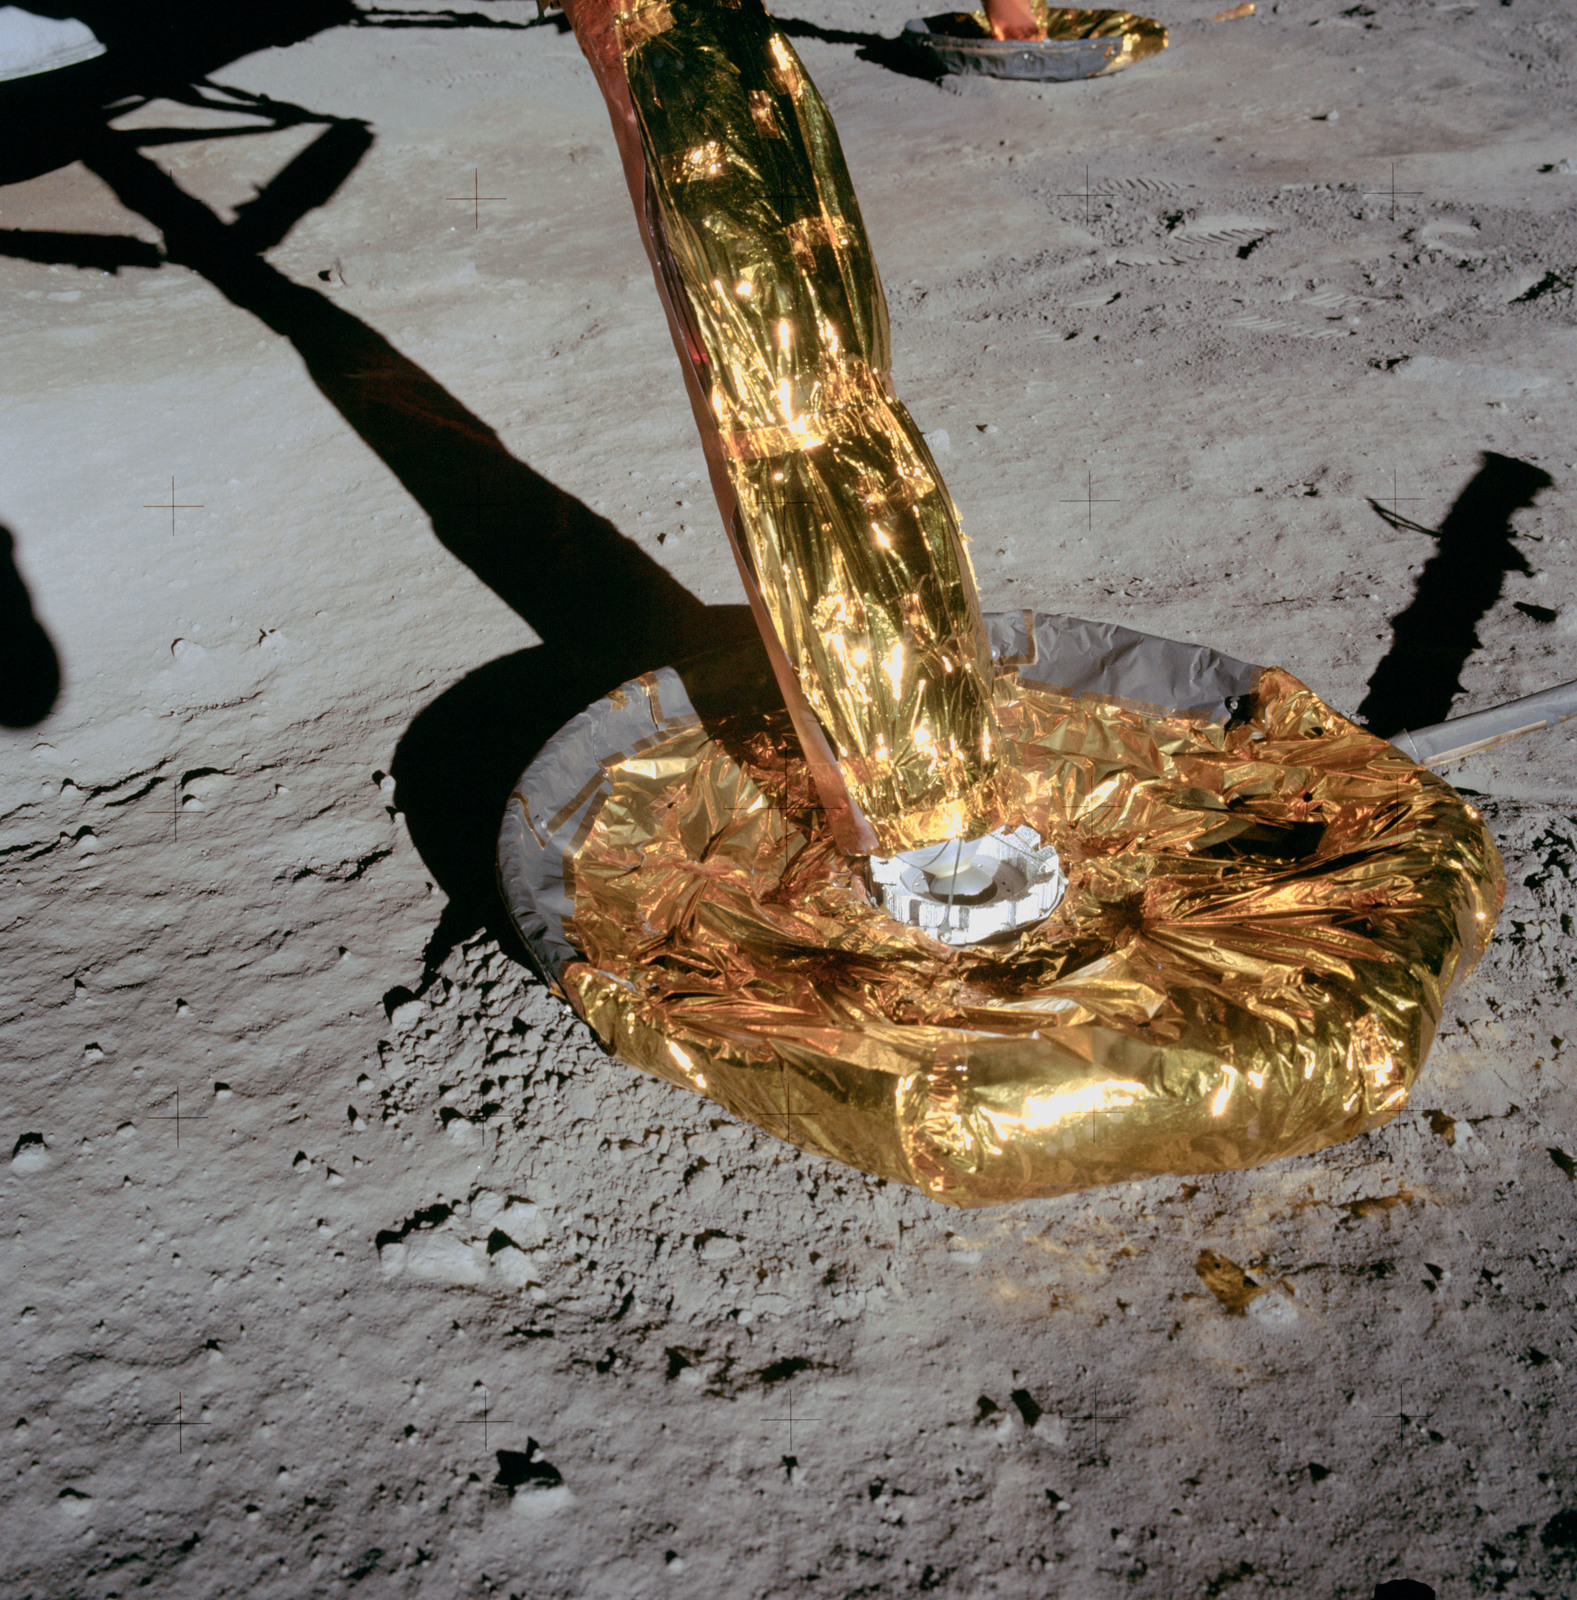 AS11-40-5926 - Apollo 11 - Apollo 11 Mission image -  -Z Lunar Module footpad